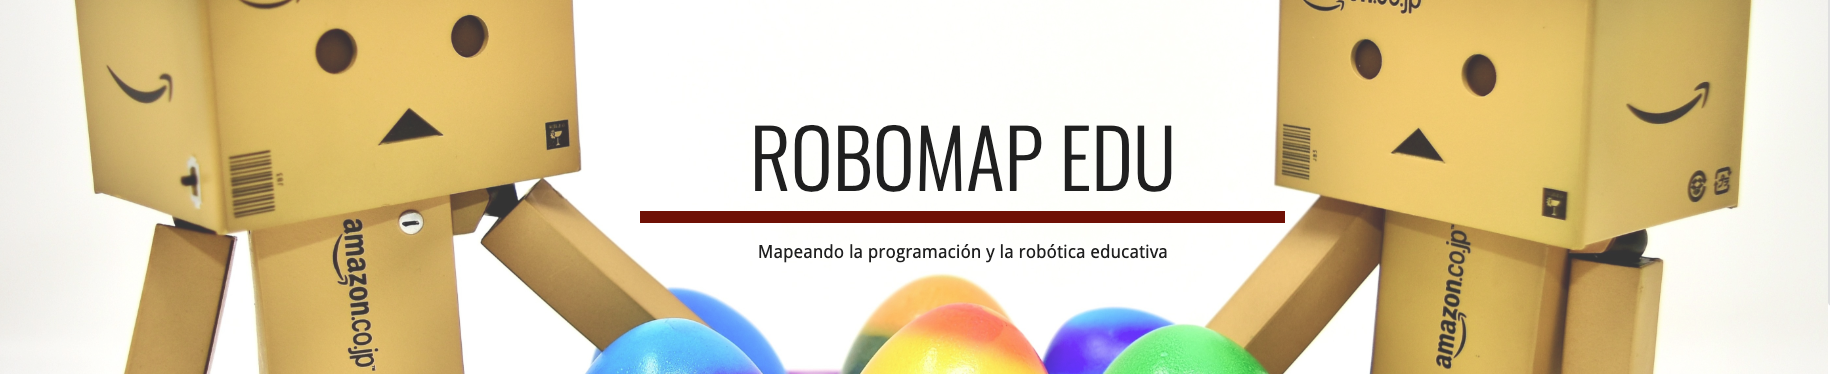 Robomap EDU